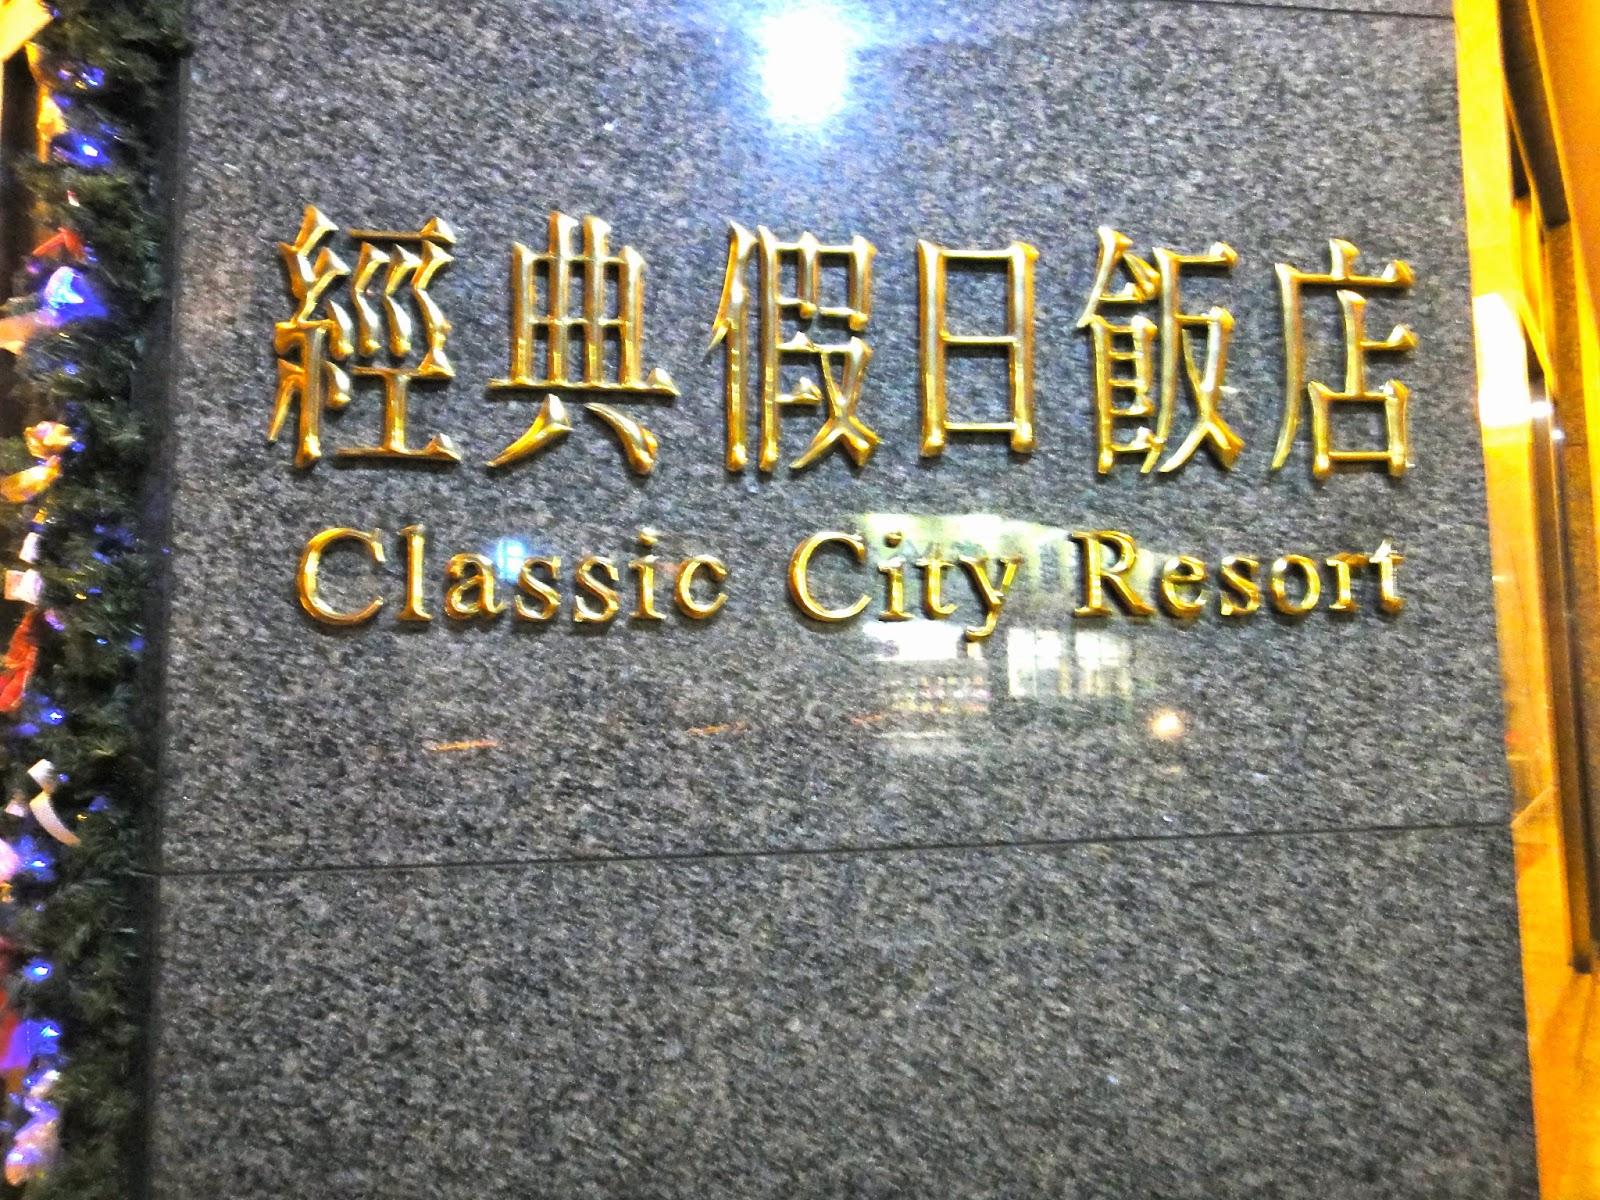 Classic City Resort Hotel Hualien Taiwan